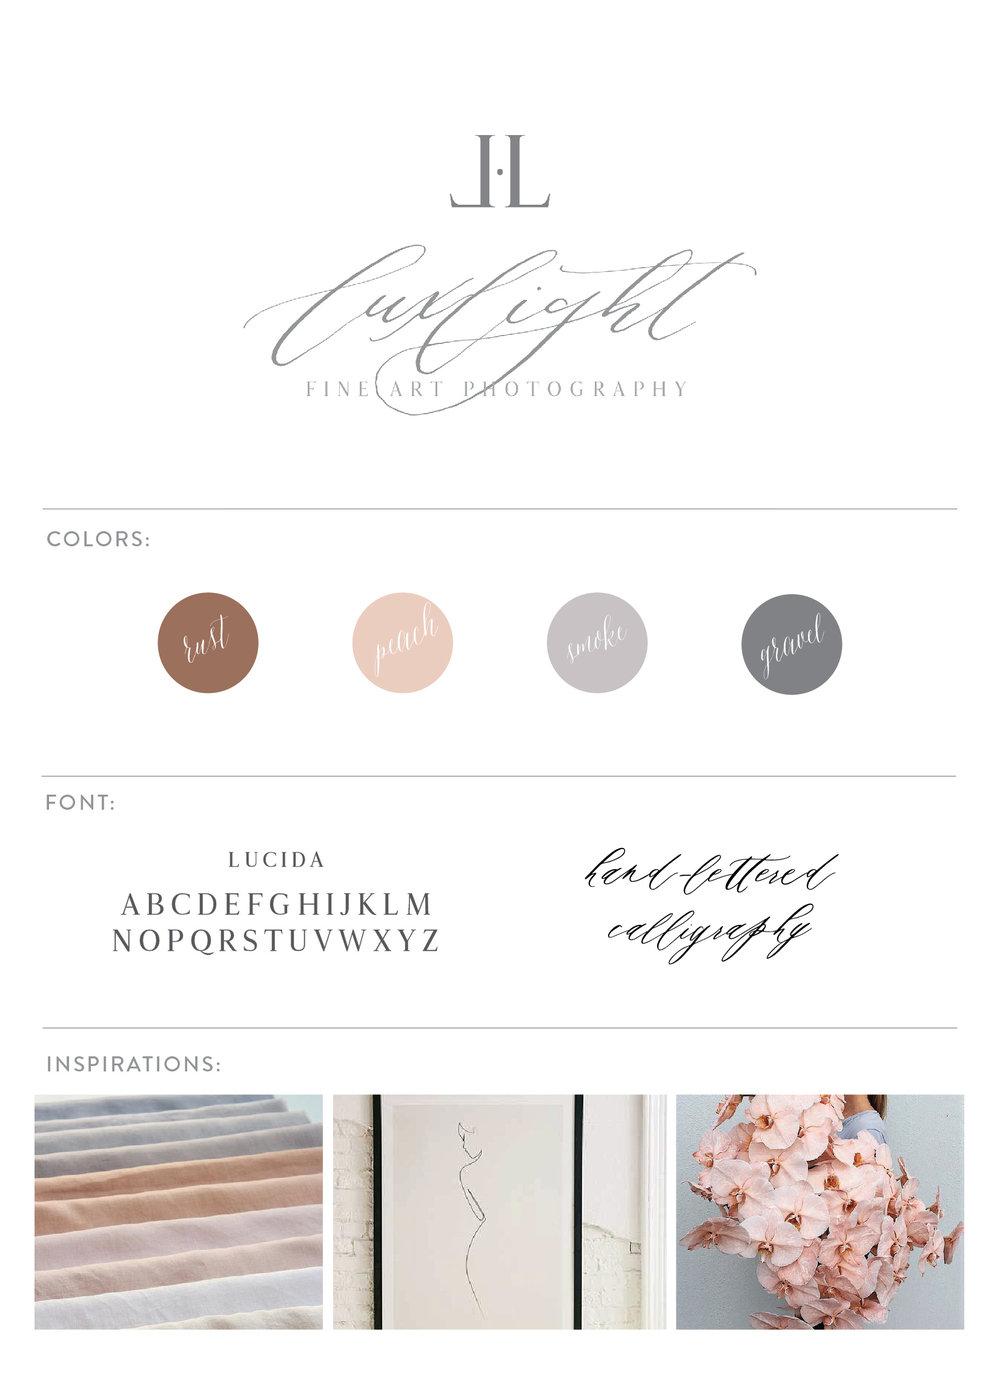 Lande, Melissa - Branding Board Final-01.jpg